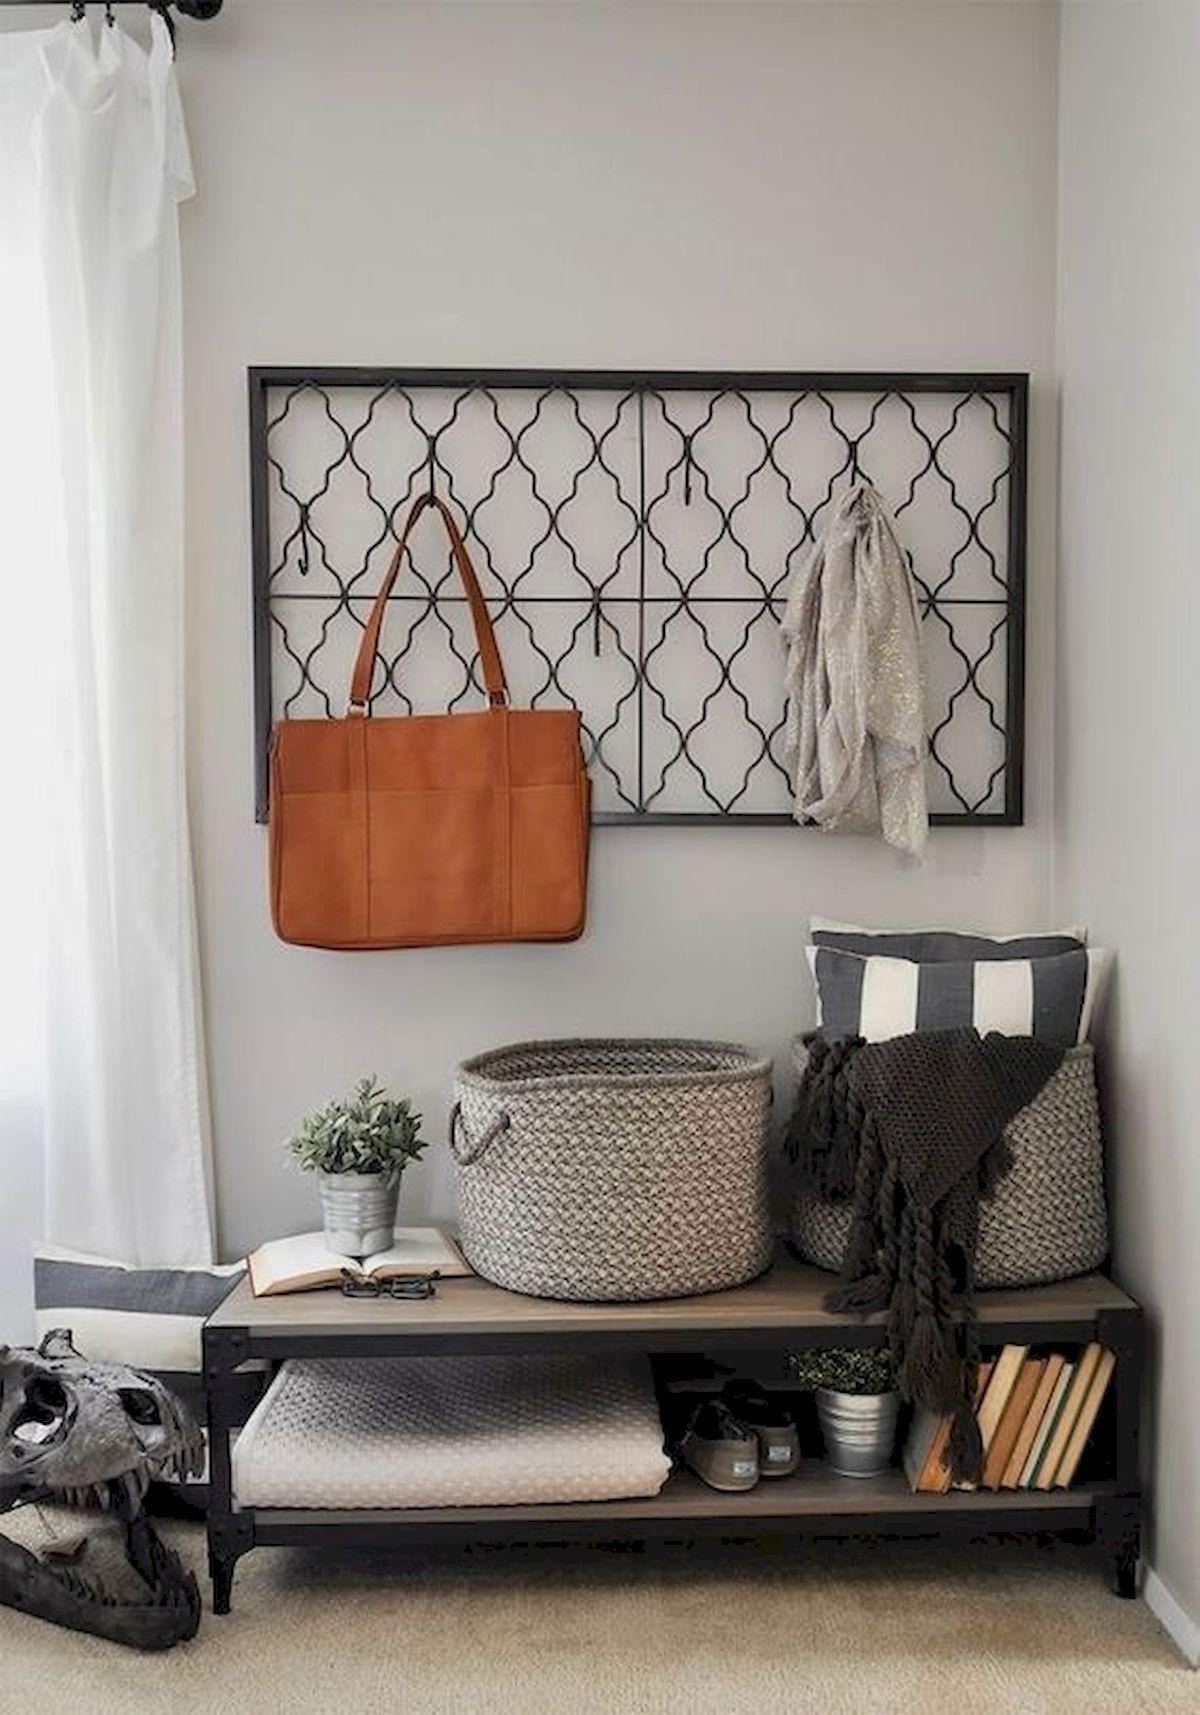 30 Creative DIY Industrial Design Ideas for Wall Decor (29)